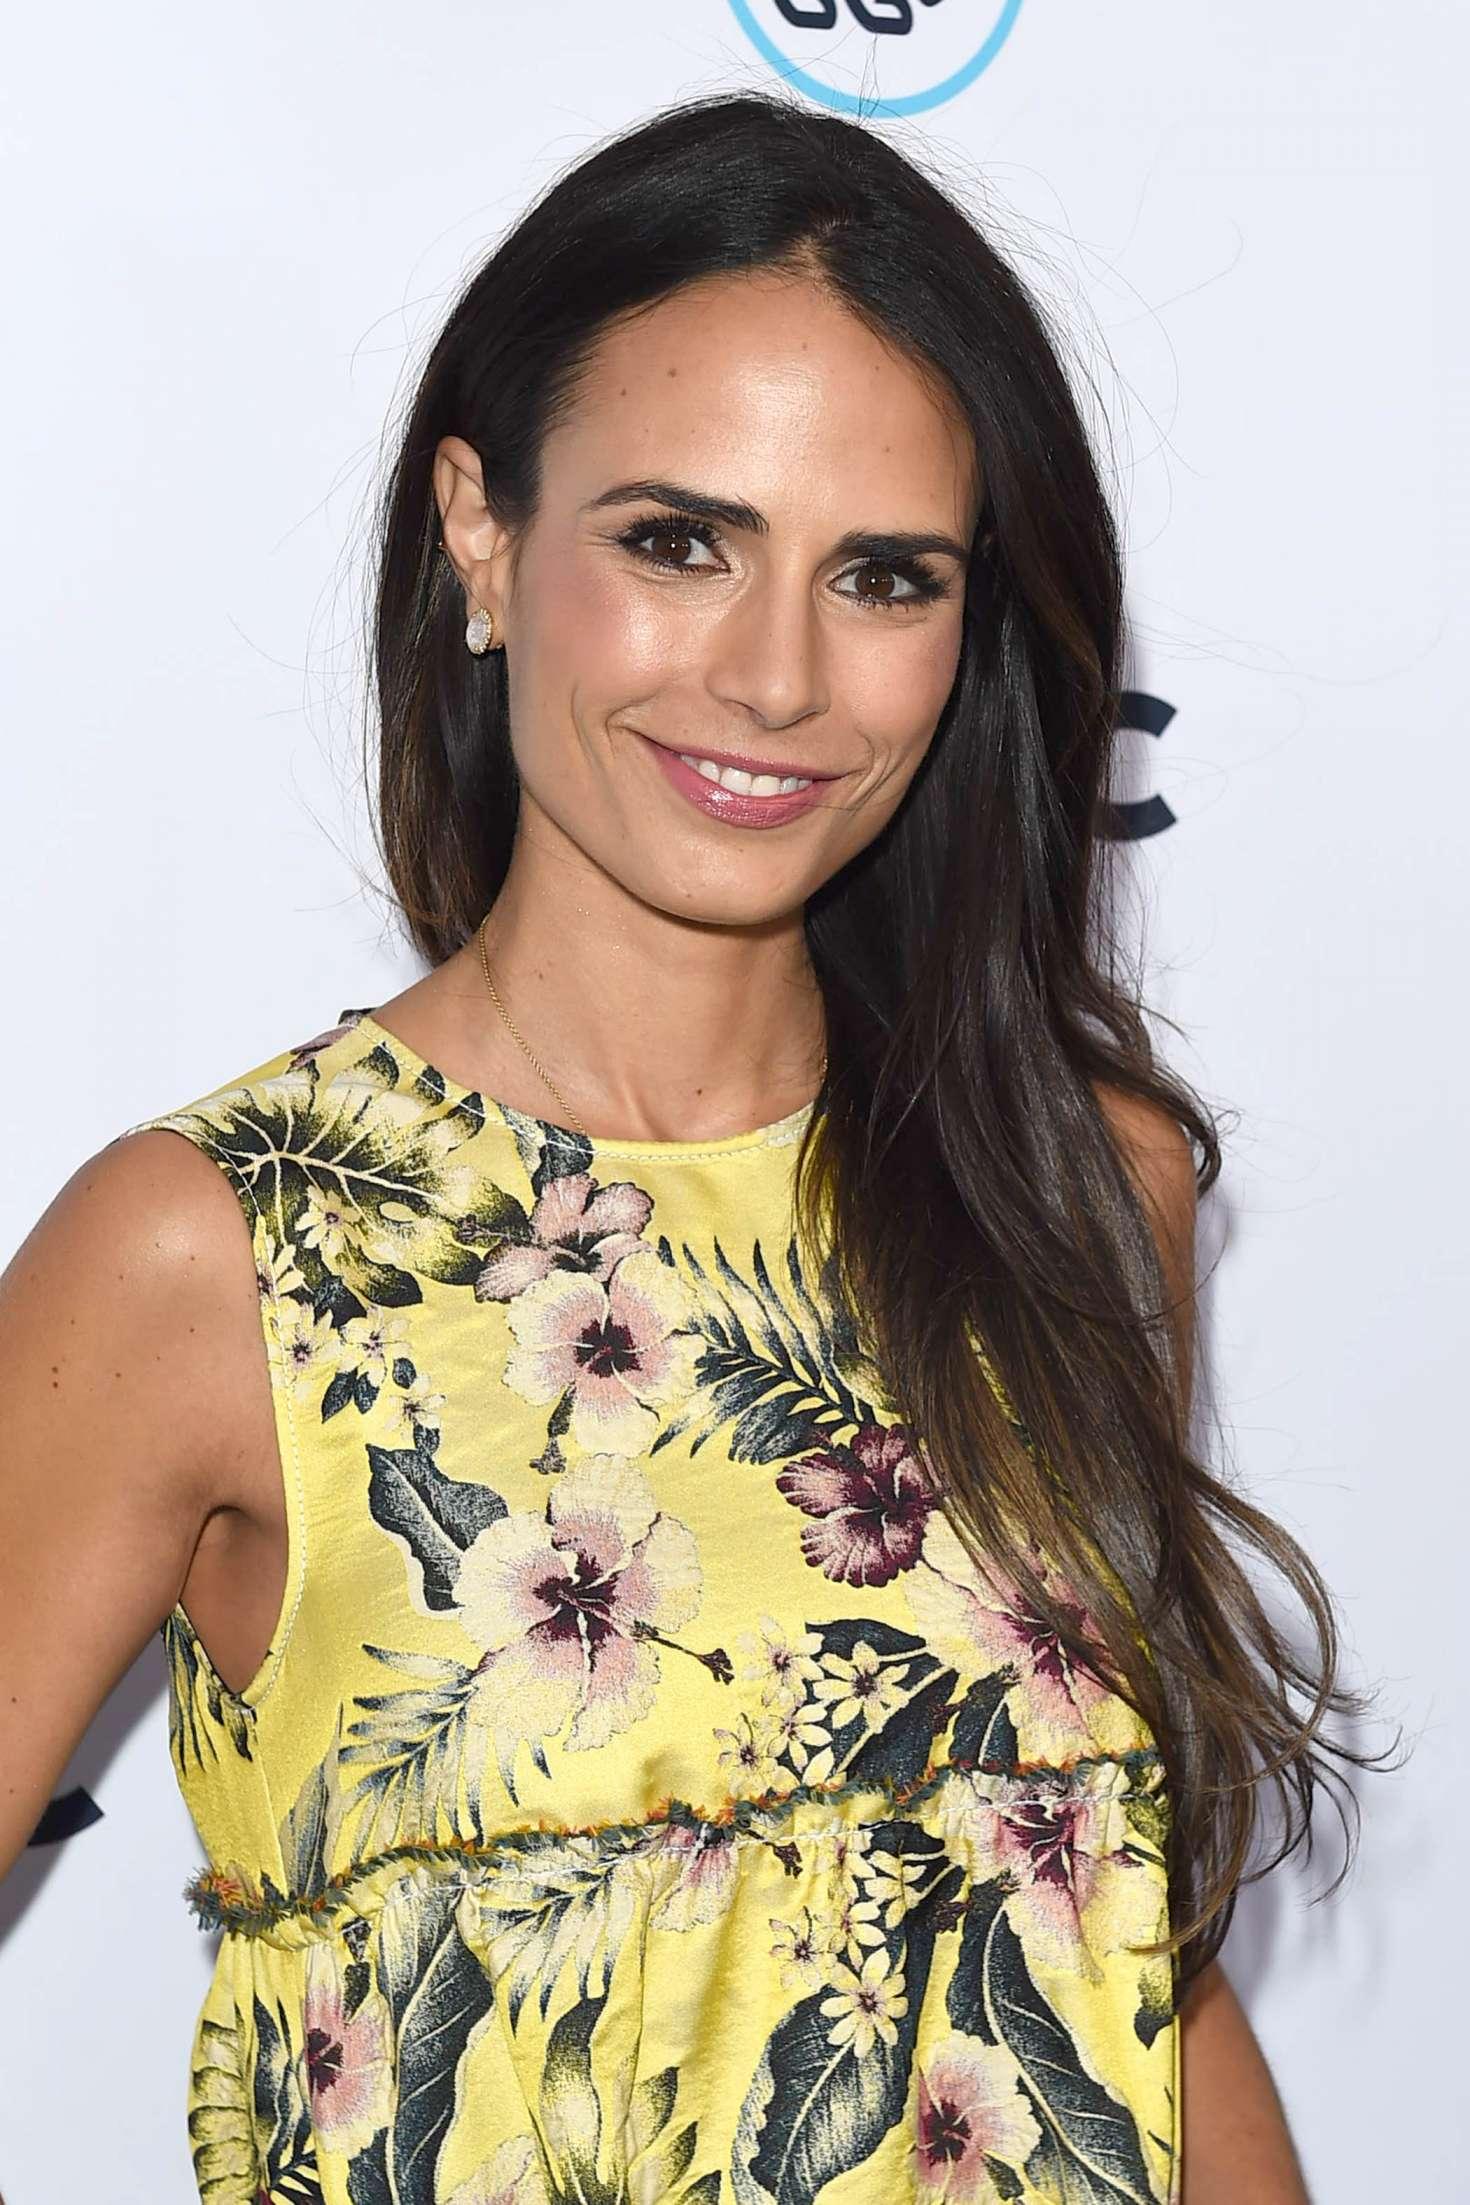 Watch Laura marano celebrity social media video